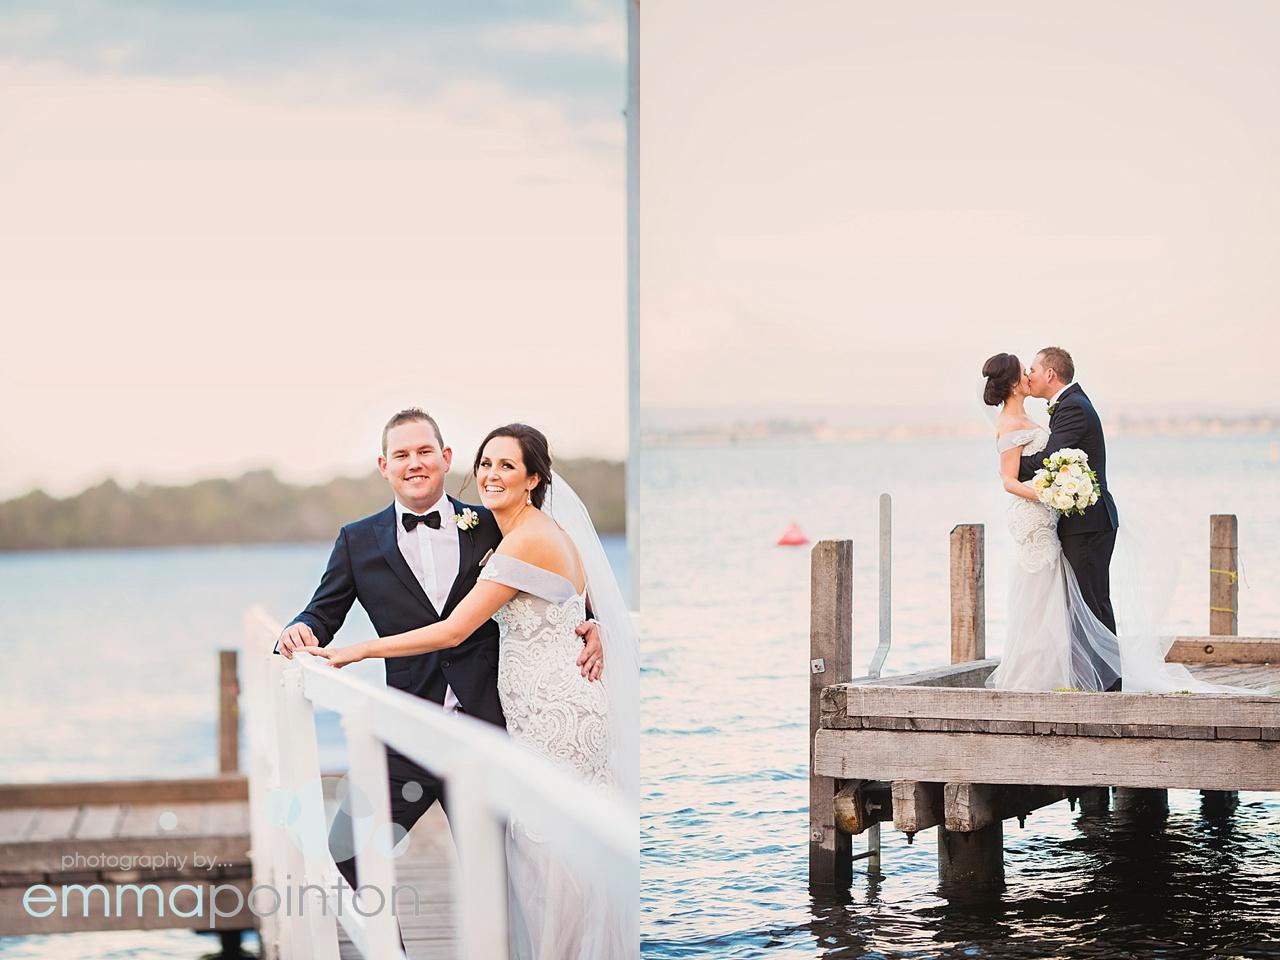 Perth Wedding Photography 069.jpg